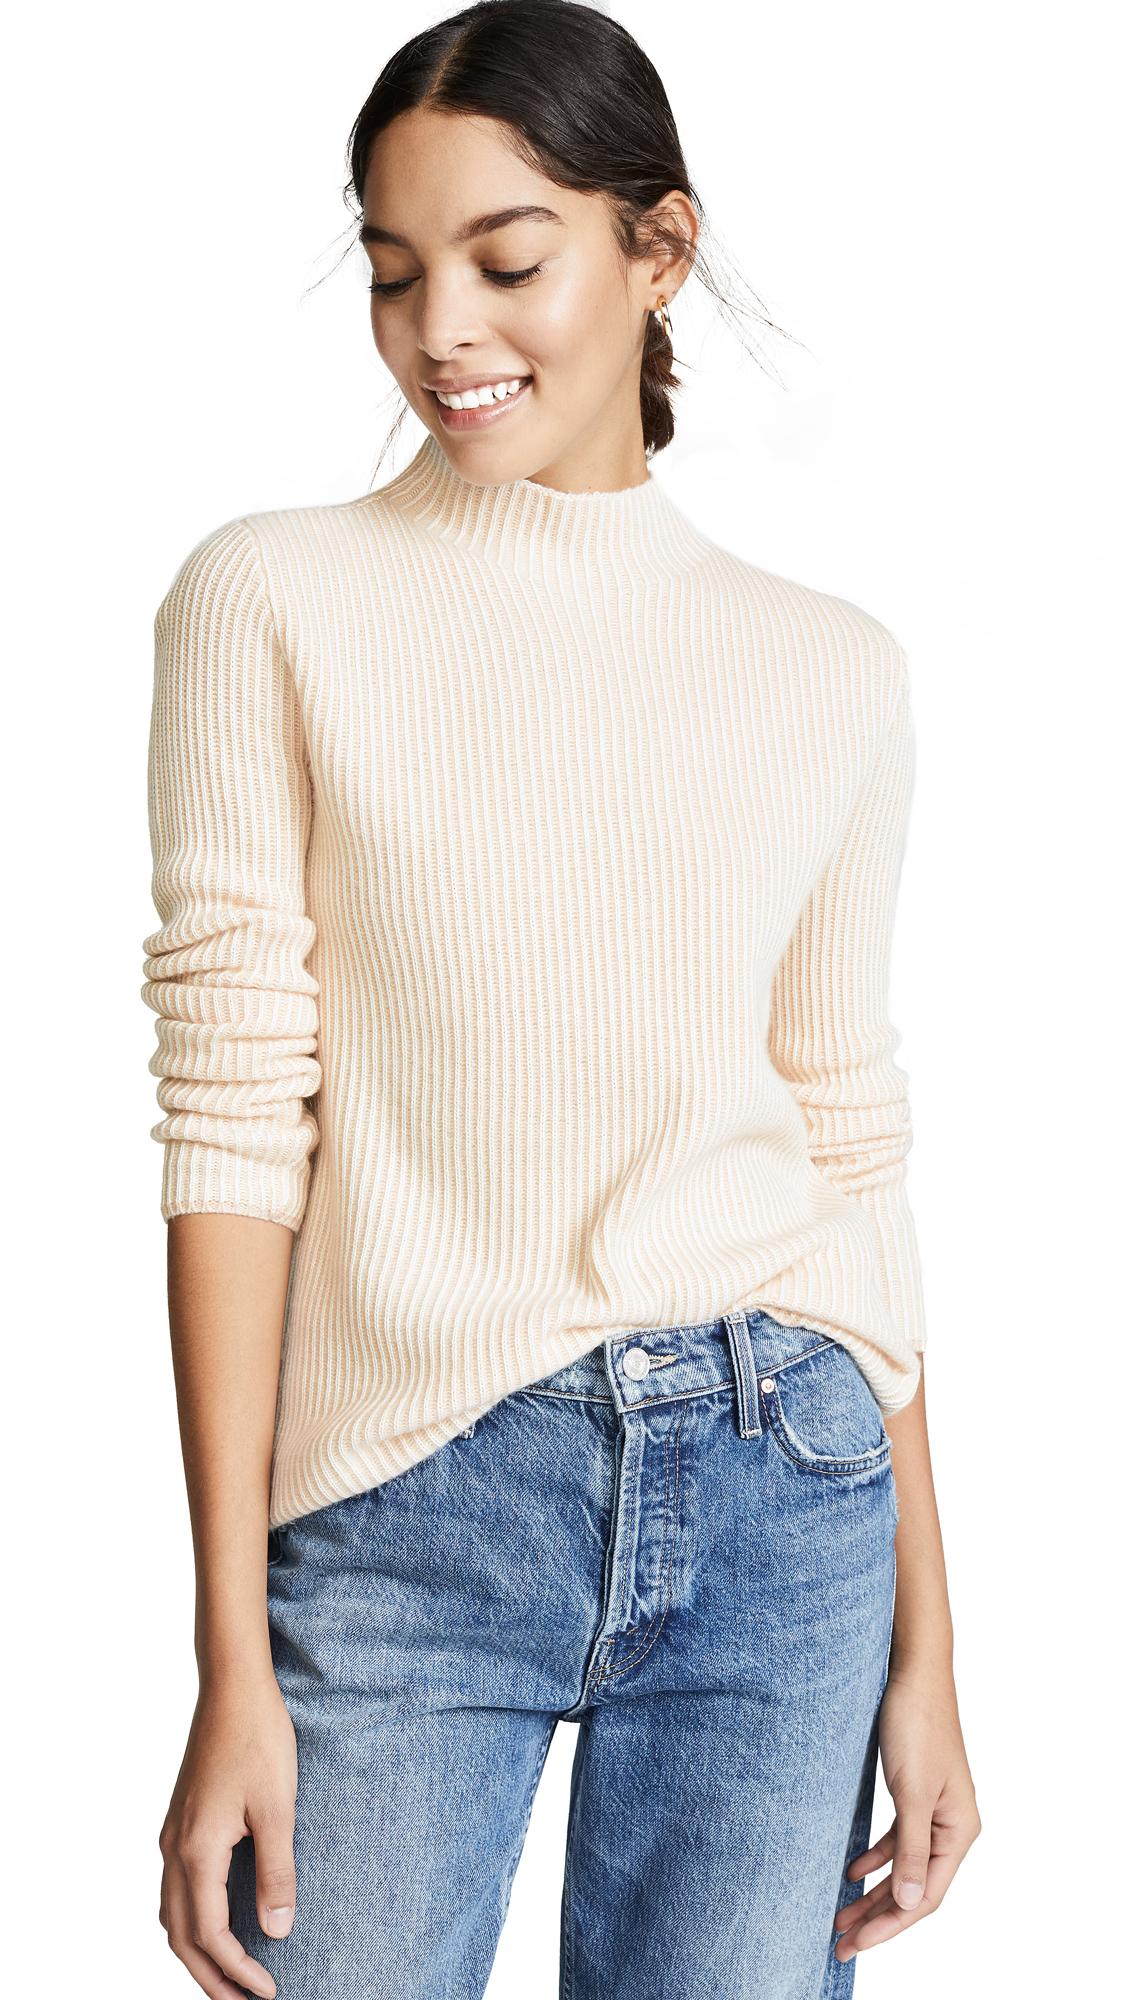 Club Monaco Margee Cashmere Sweater - Praline